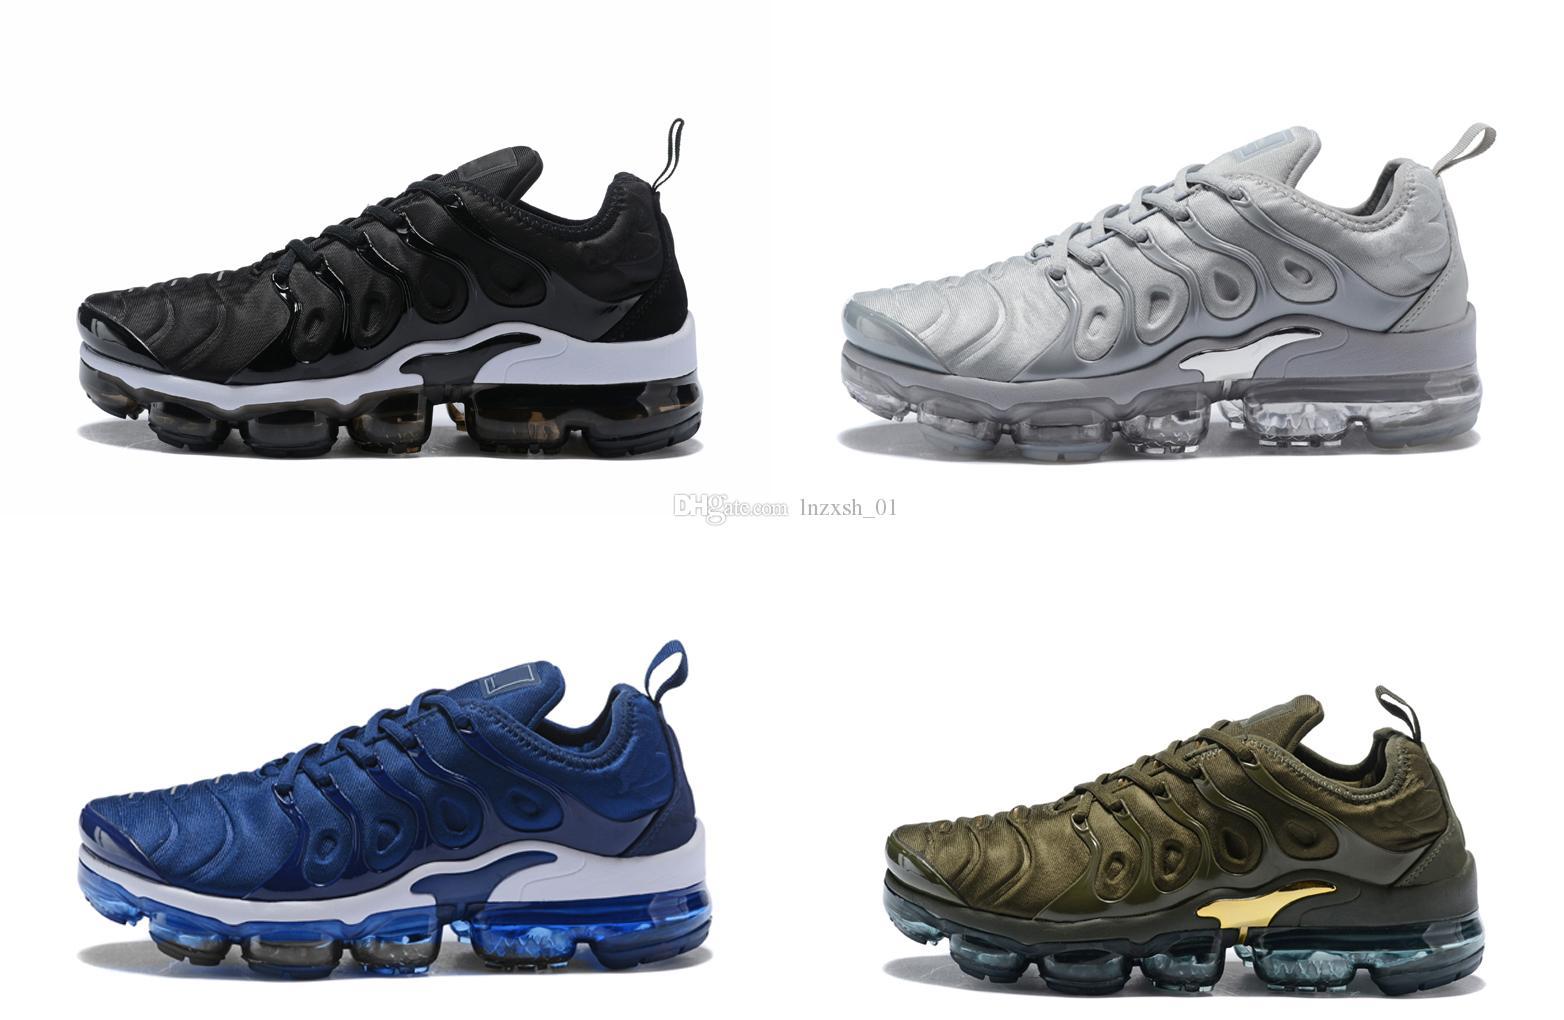 2018 High Qaulity Vapormax TN Plus Mesh Breathable Running Shoes Men Women Sport Shoes Sneakers athletics cheap perfect sale visa payment GELqXXWp